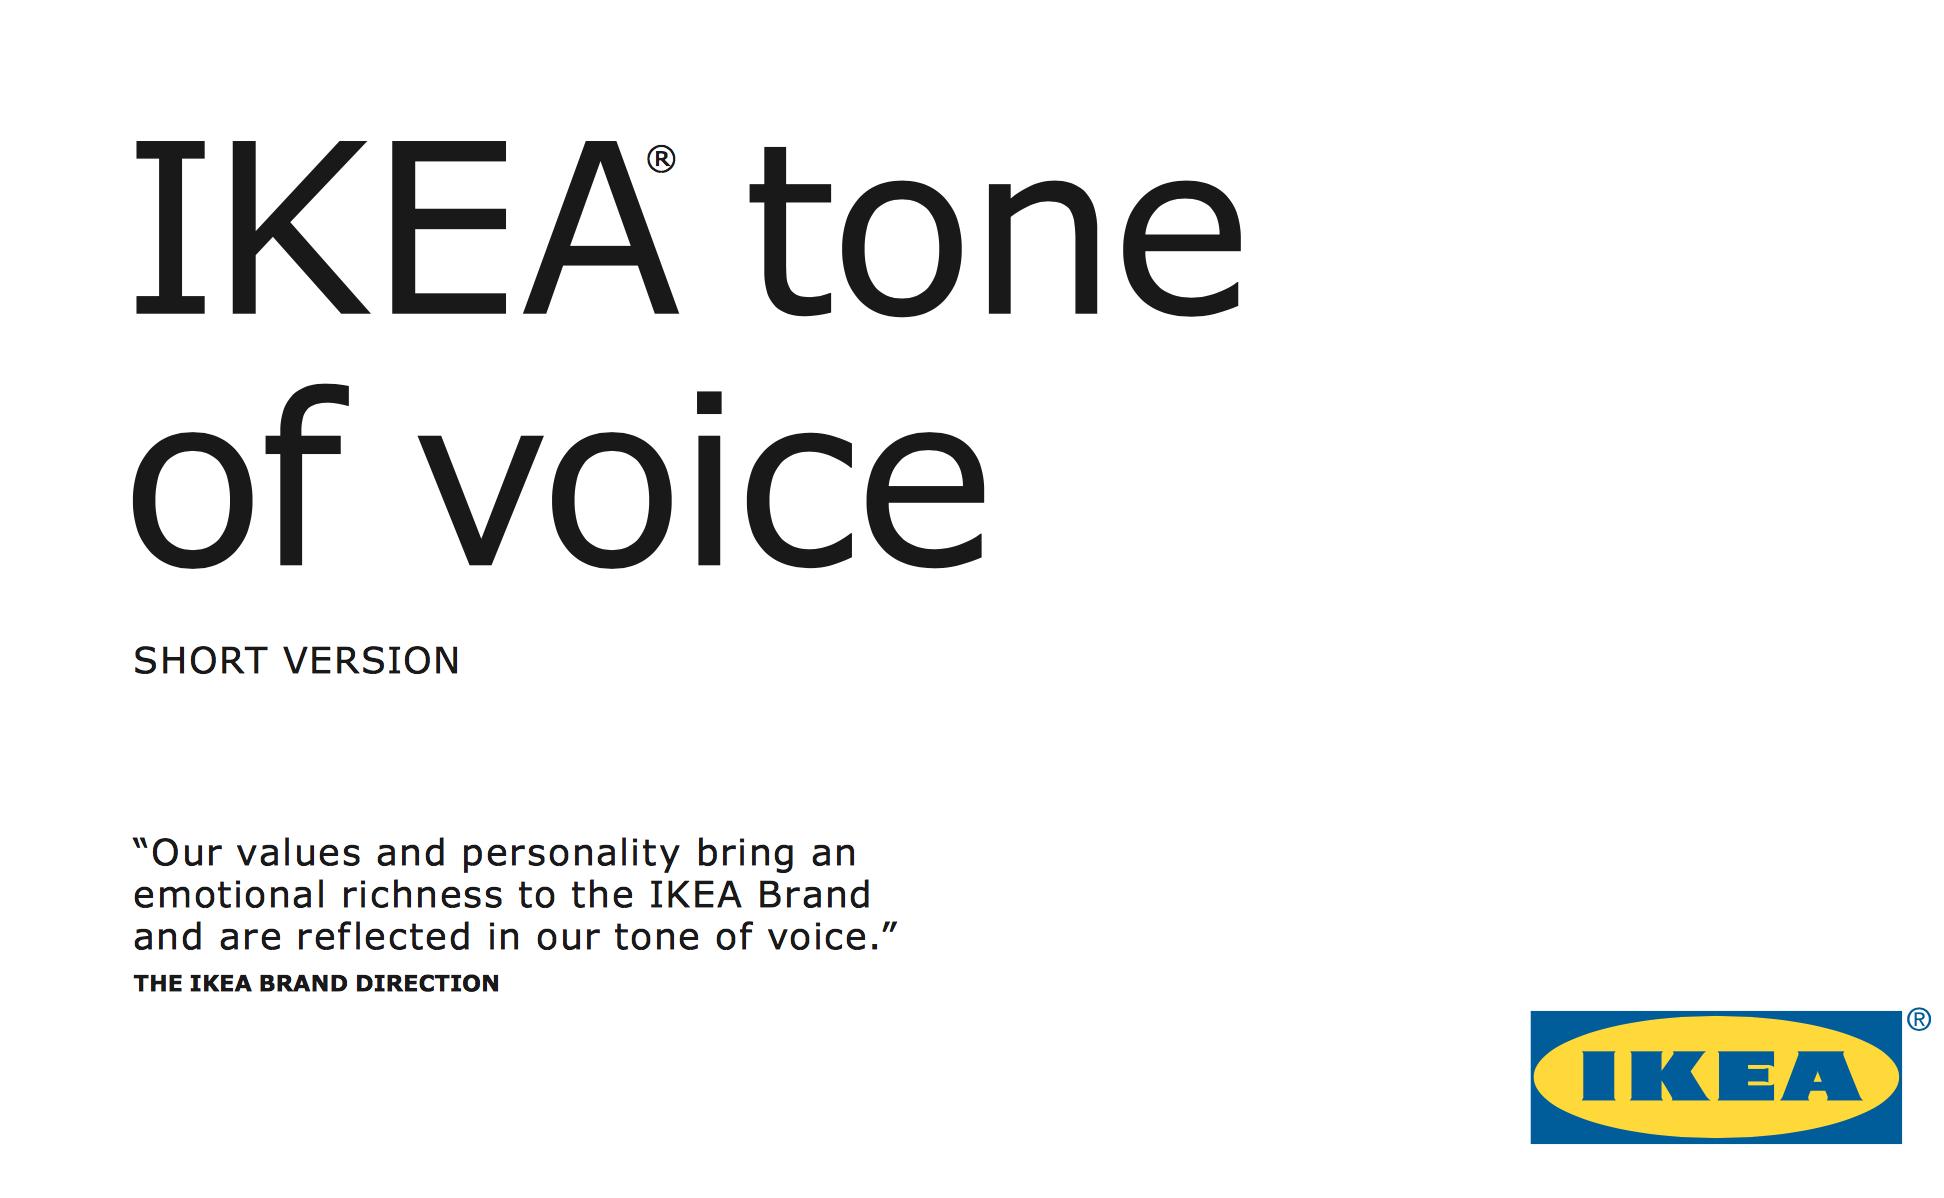 IKEA tone of voice